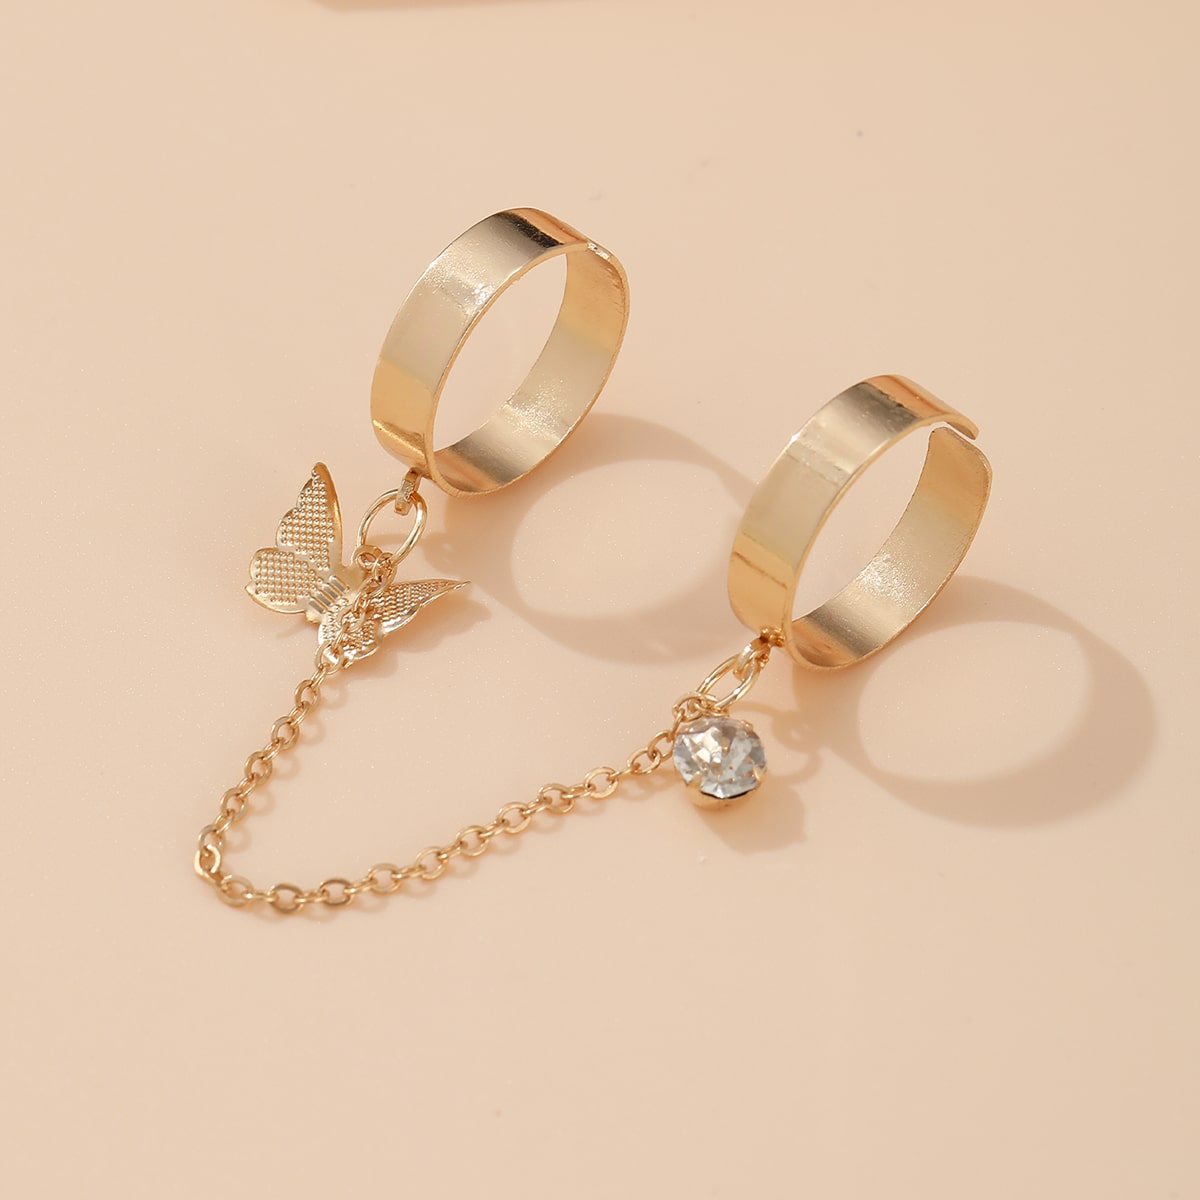 Кольцо с бабочкой варежки от SHEIN